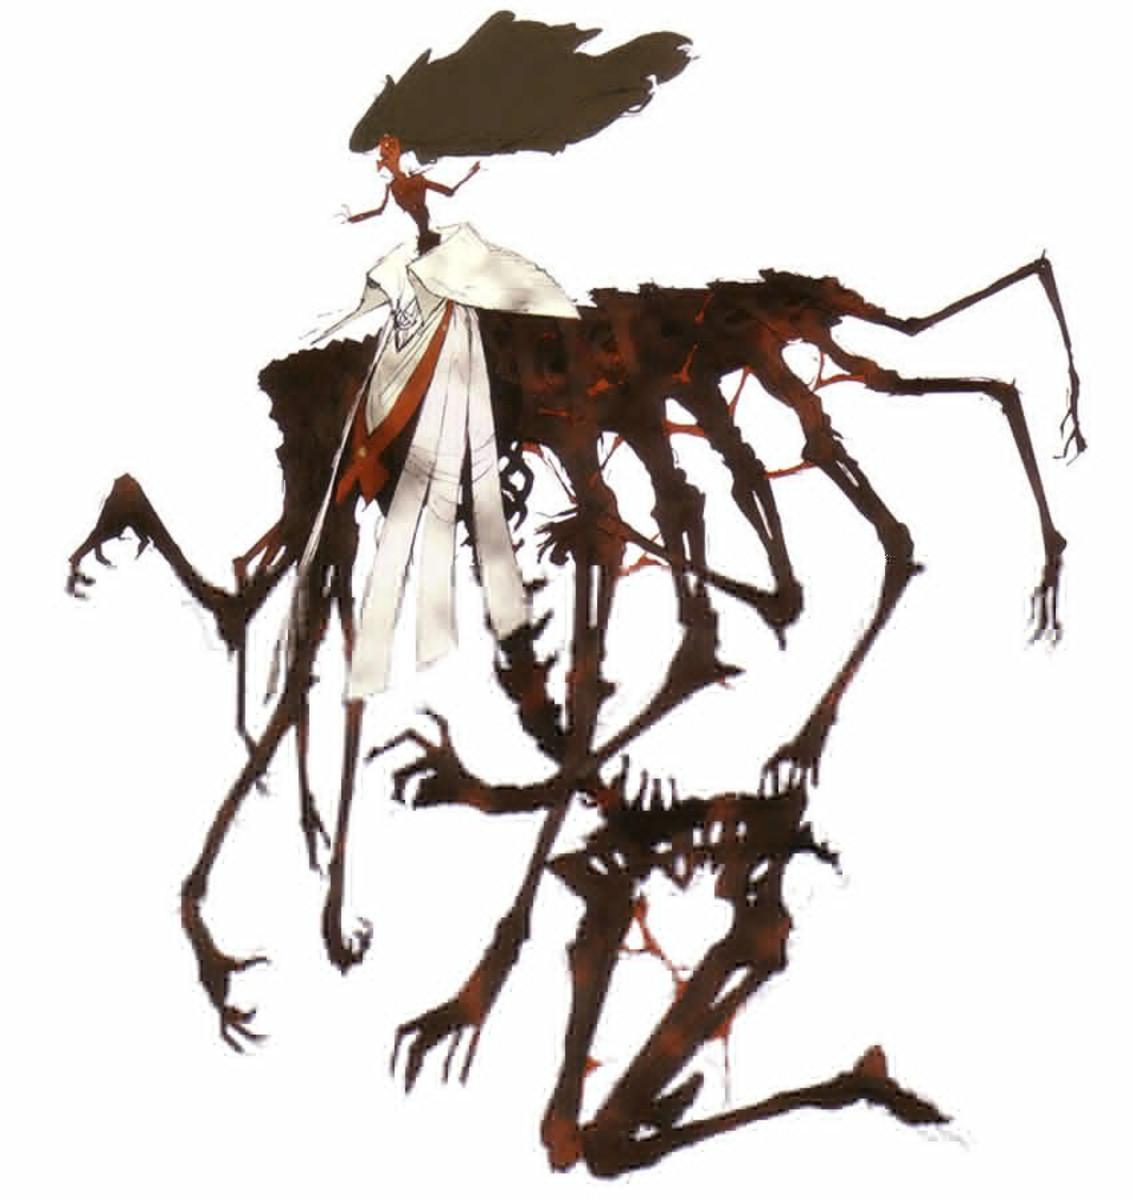 persona-4-boss-guide-walkthrough-part-3-heaven-twisted-inaba-yomotsu-hirasaka